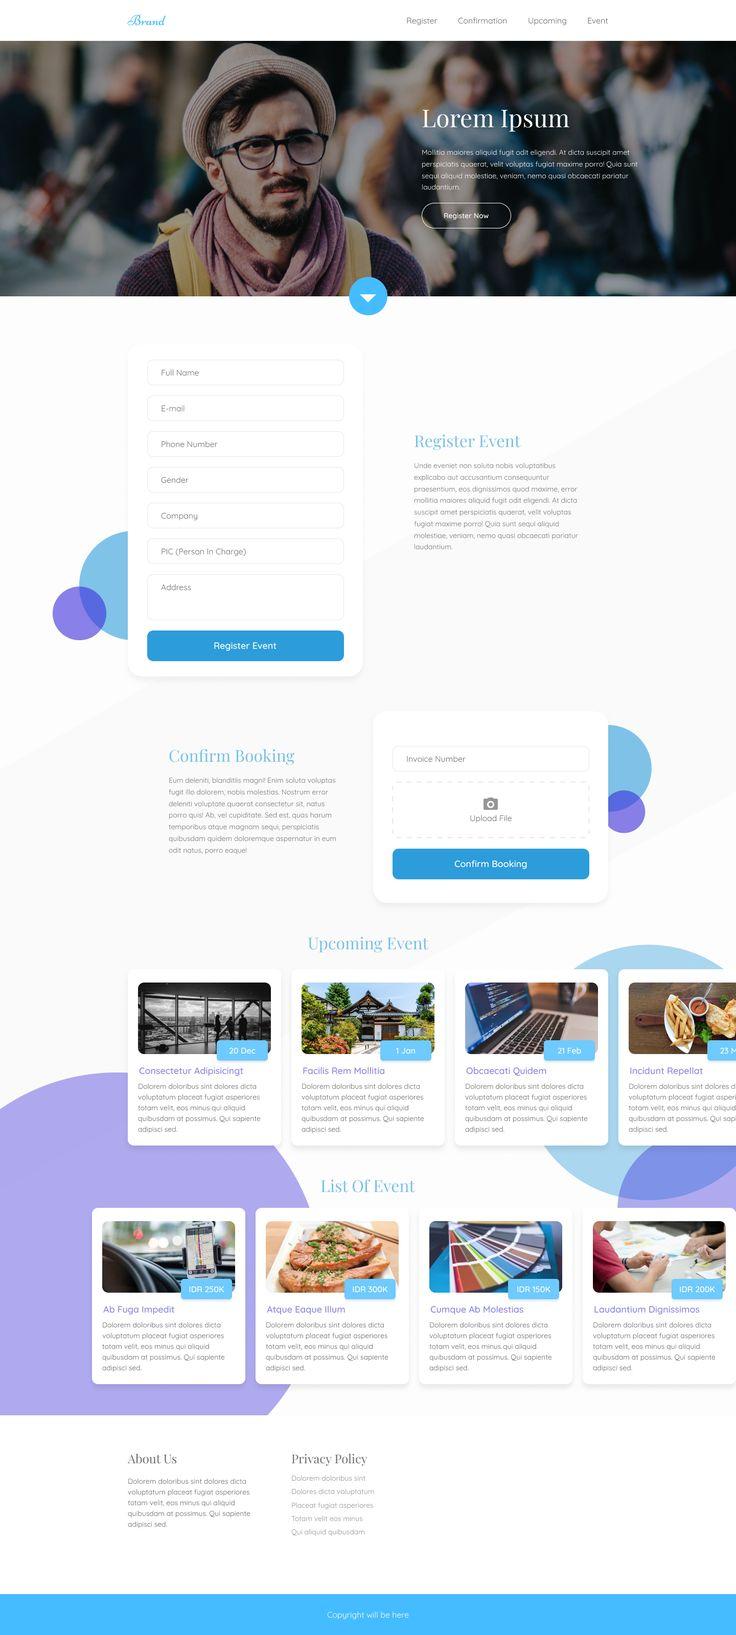 Simple landing page for event list & register